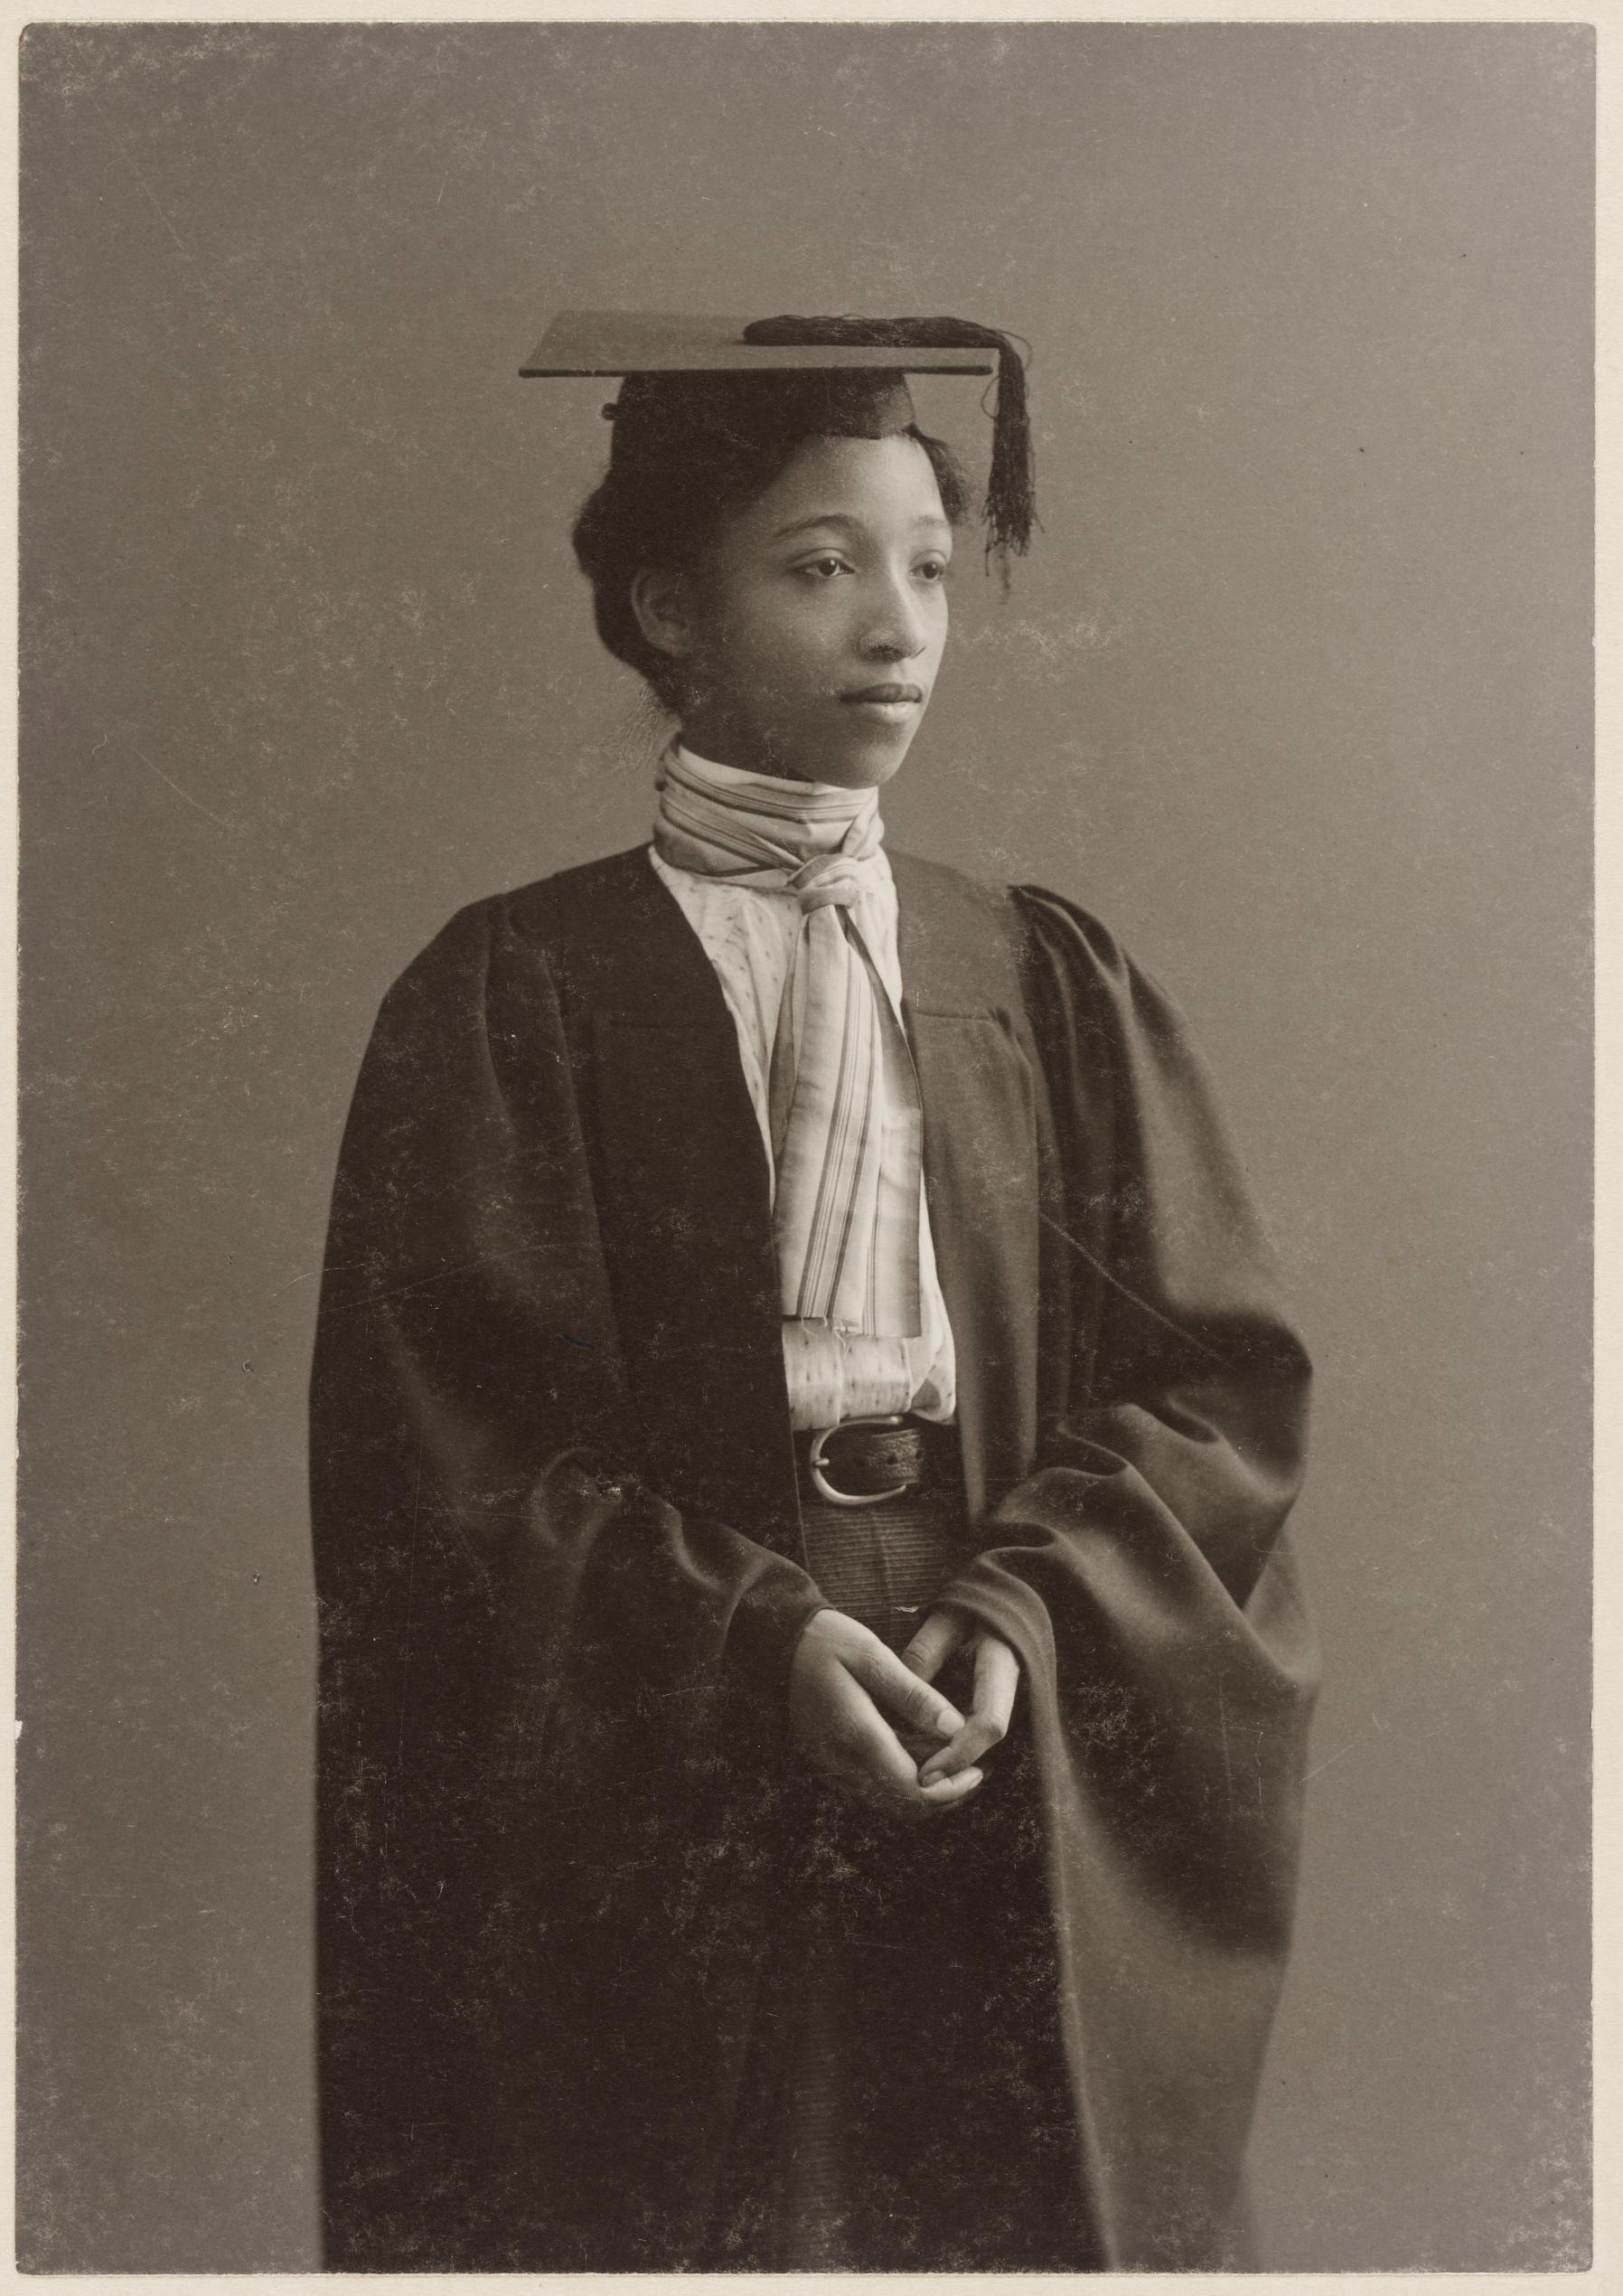 Sepia toned photograph of Alberta Virginia Scott in graduation cap & gown.